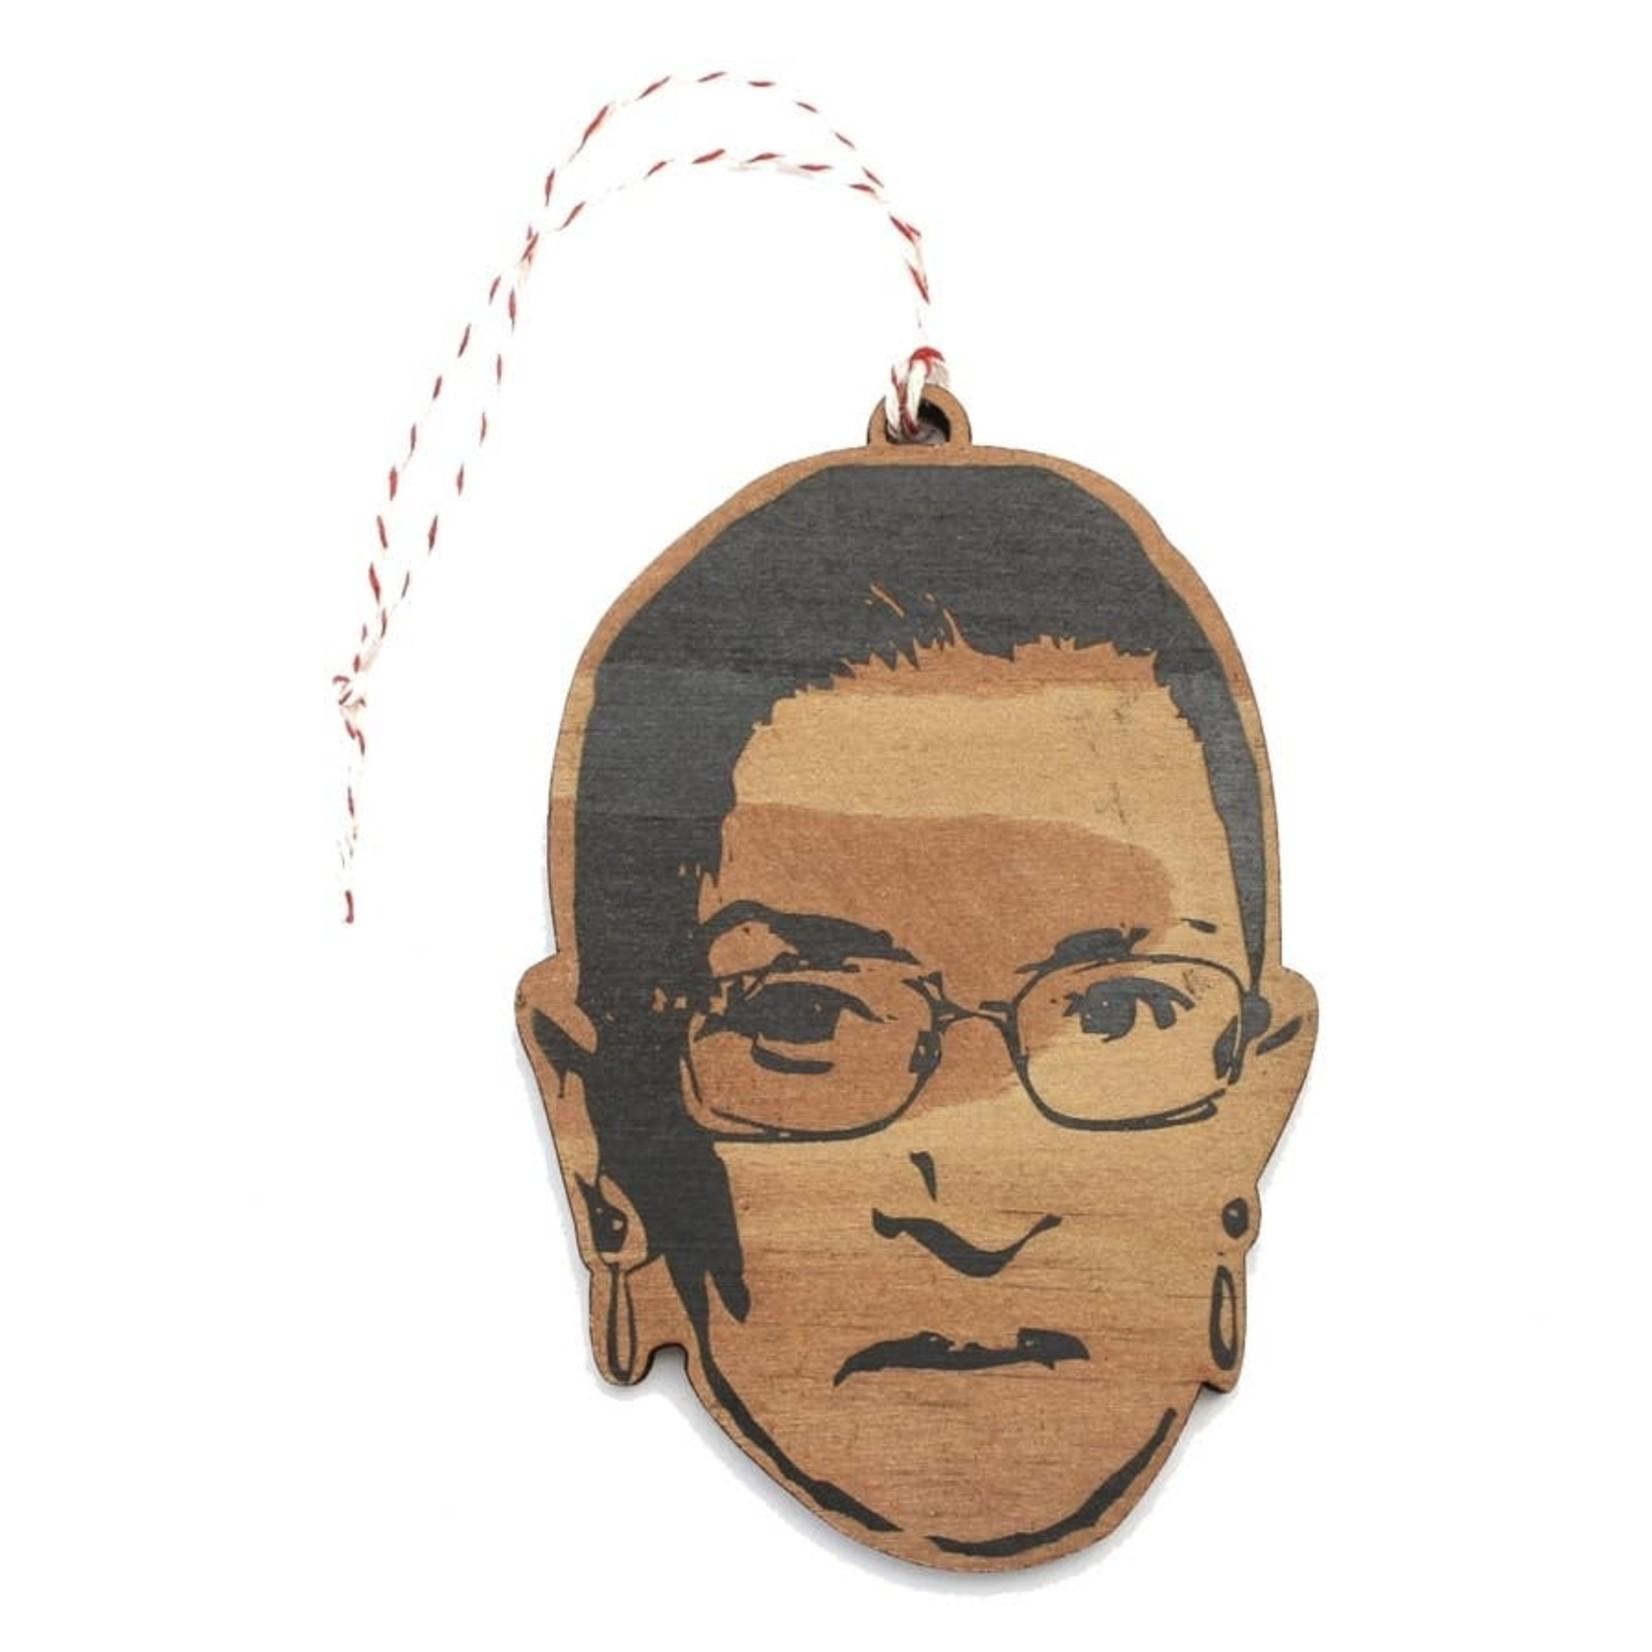 Ornament - Ruth Bader Ginsburg - RBG